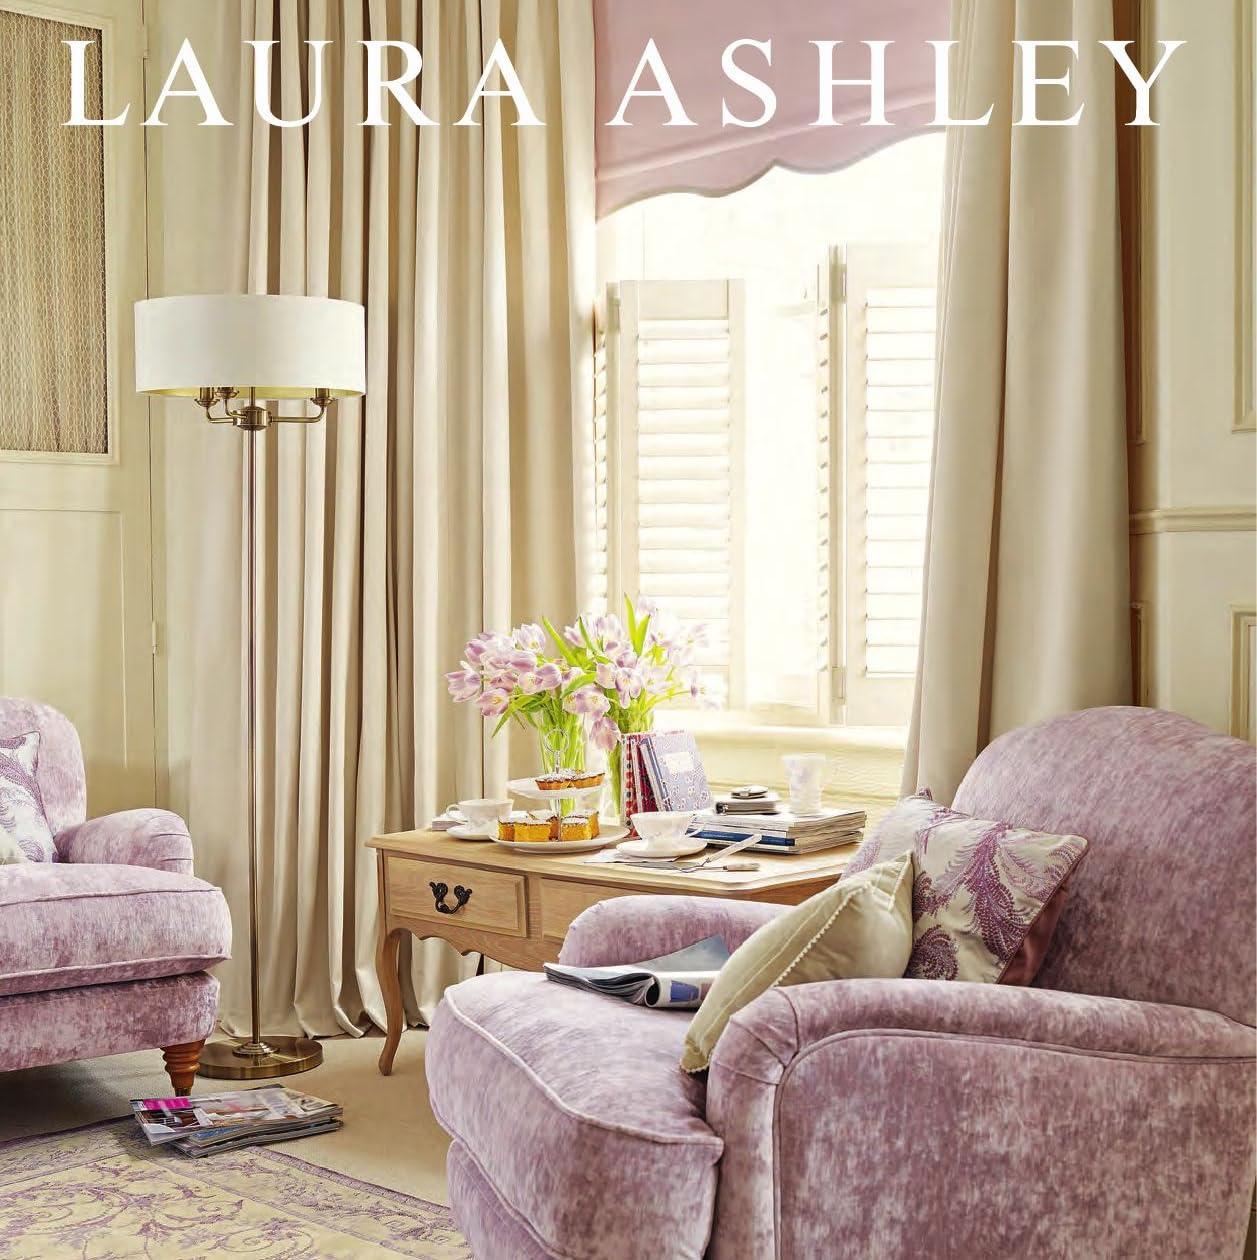 Amazon Com Laura Ashley Home Home Page